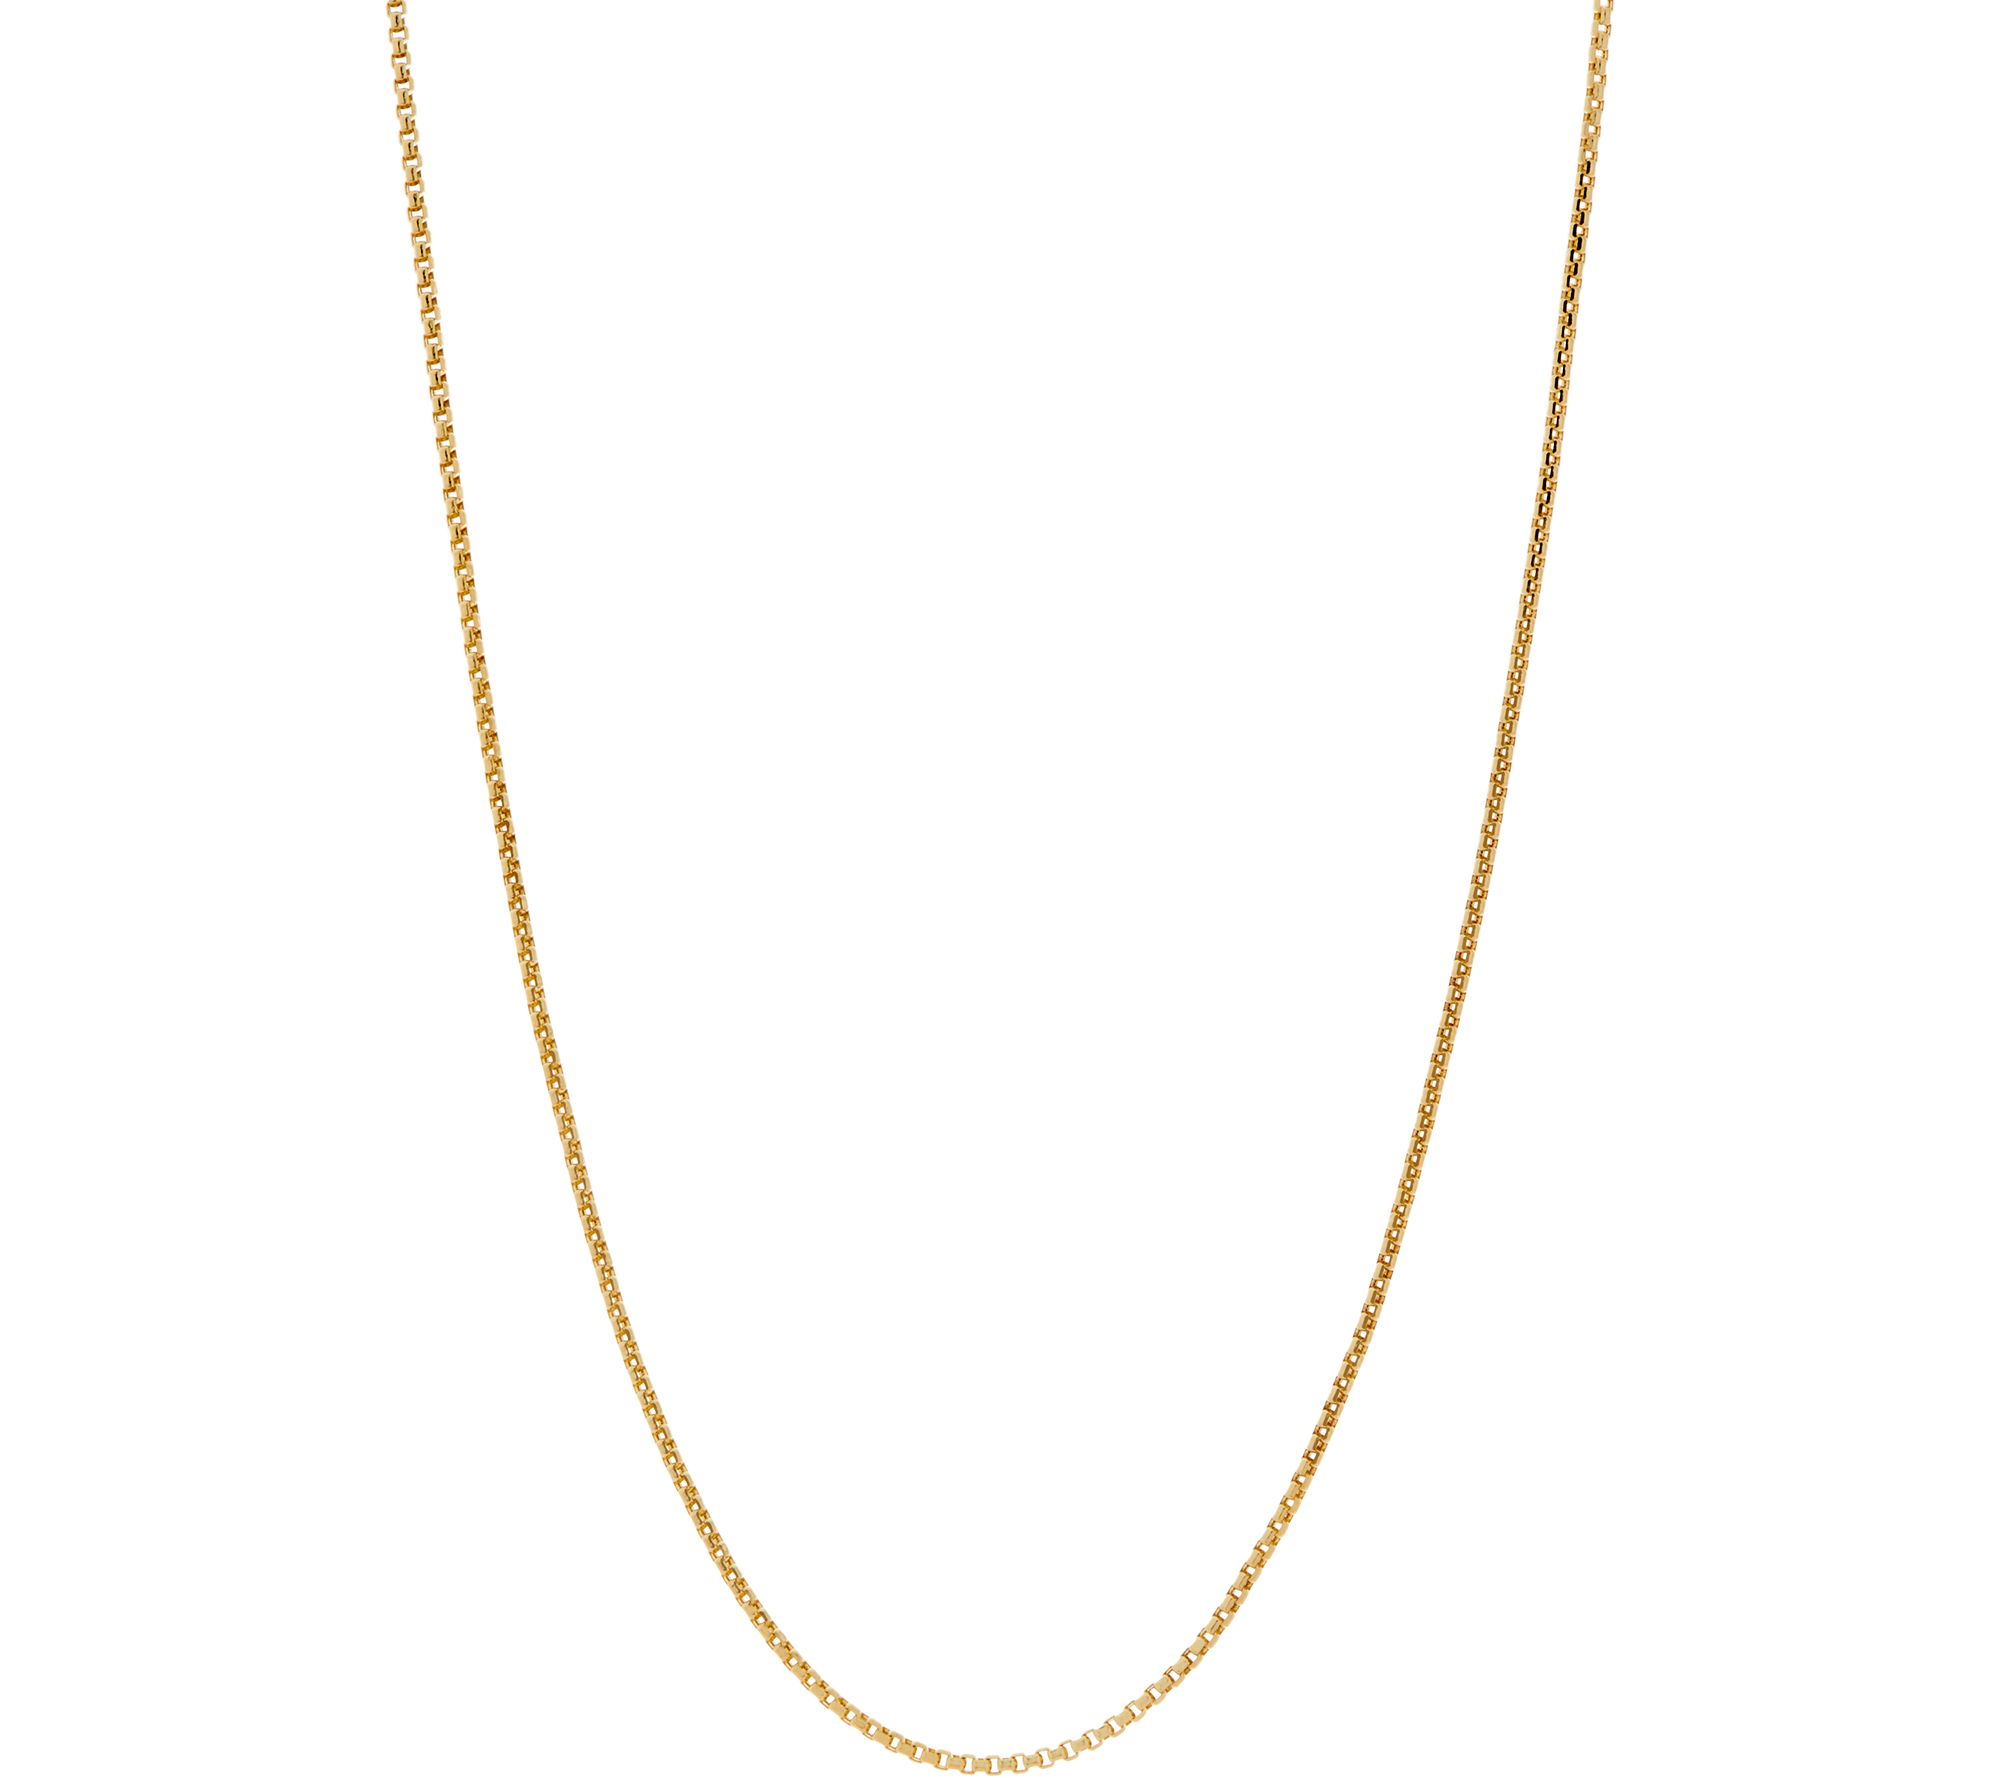 Italian Gold Round Box Chain 16